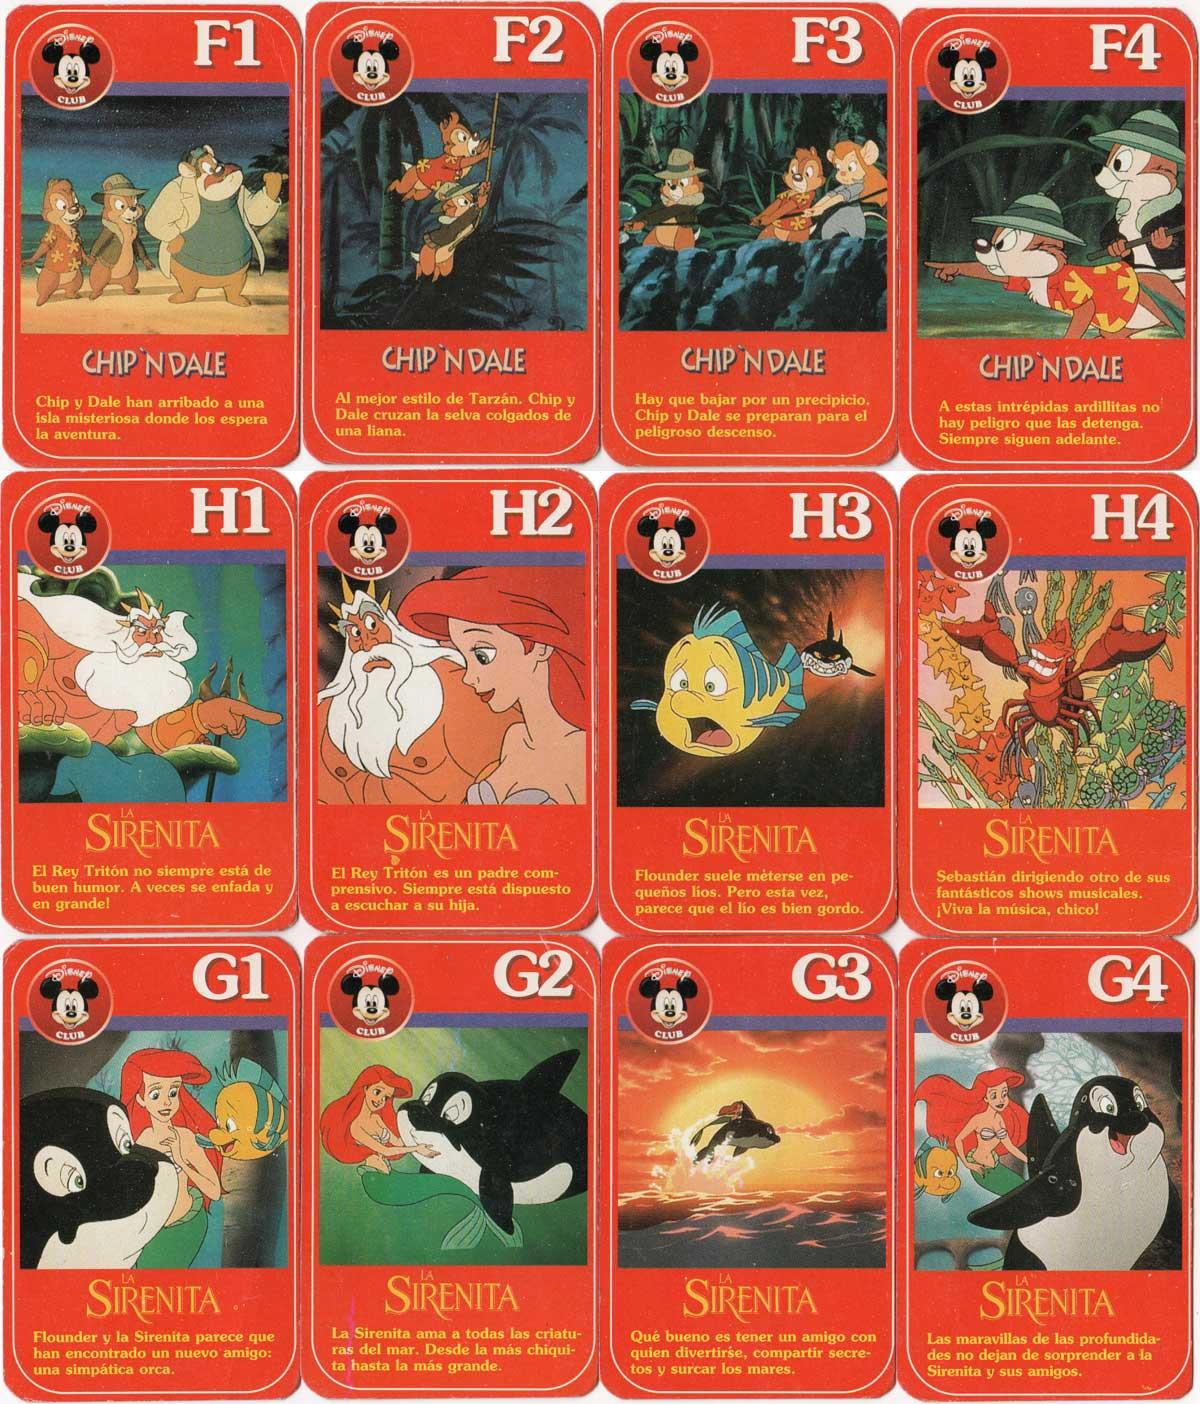 Disney Club card game by Cromy, 1990